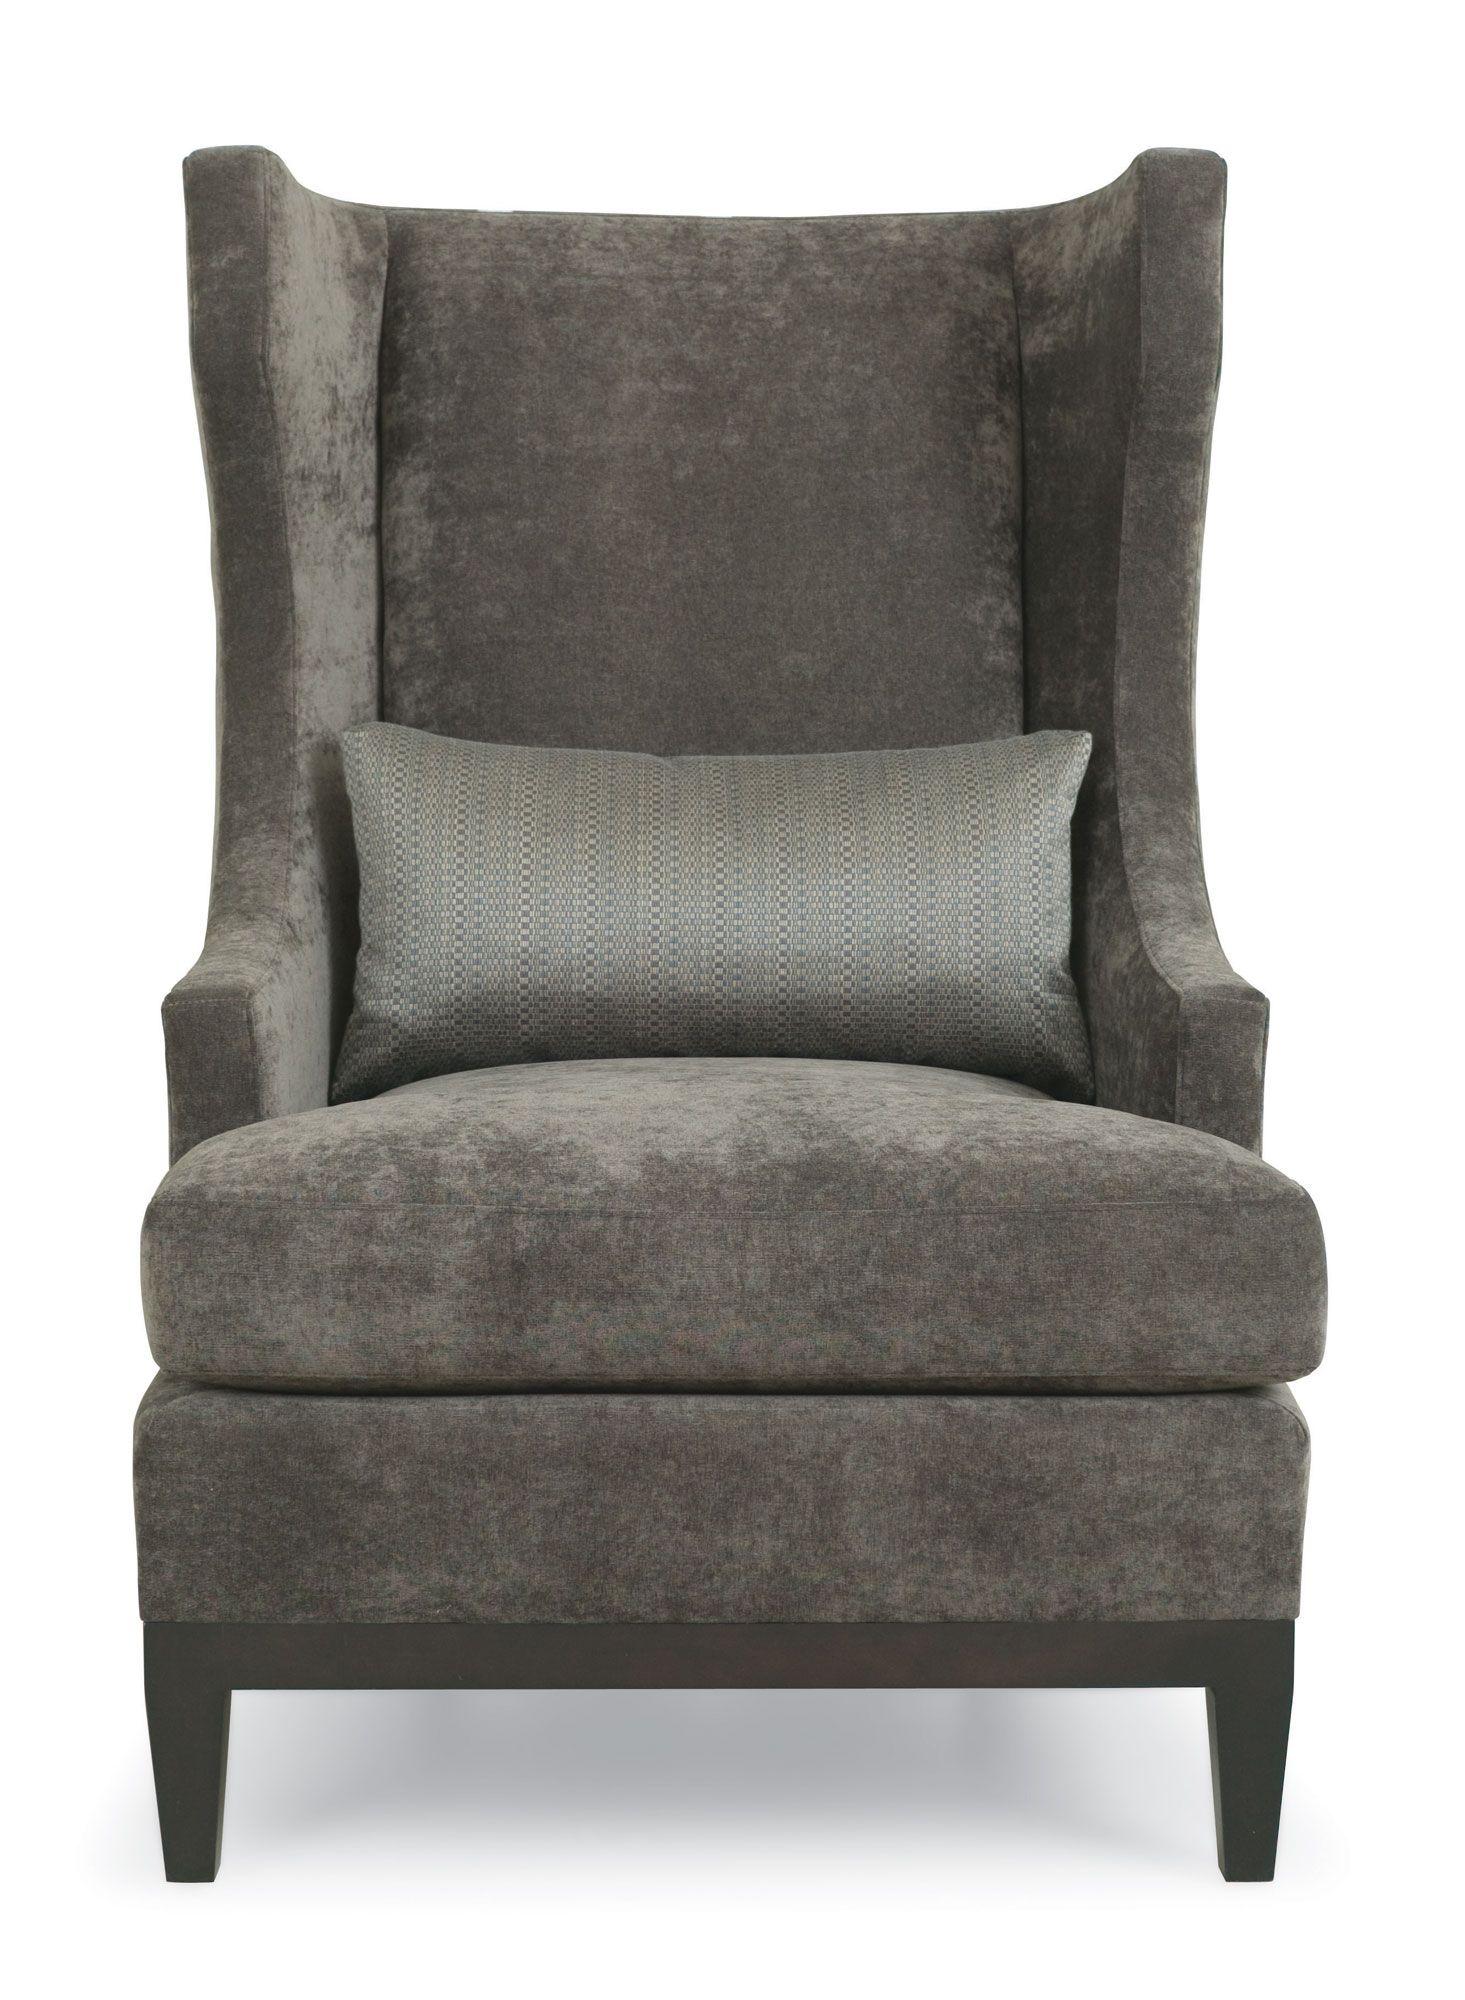 Wing chair bernhardt - Chair Bernhardt